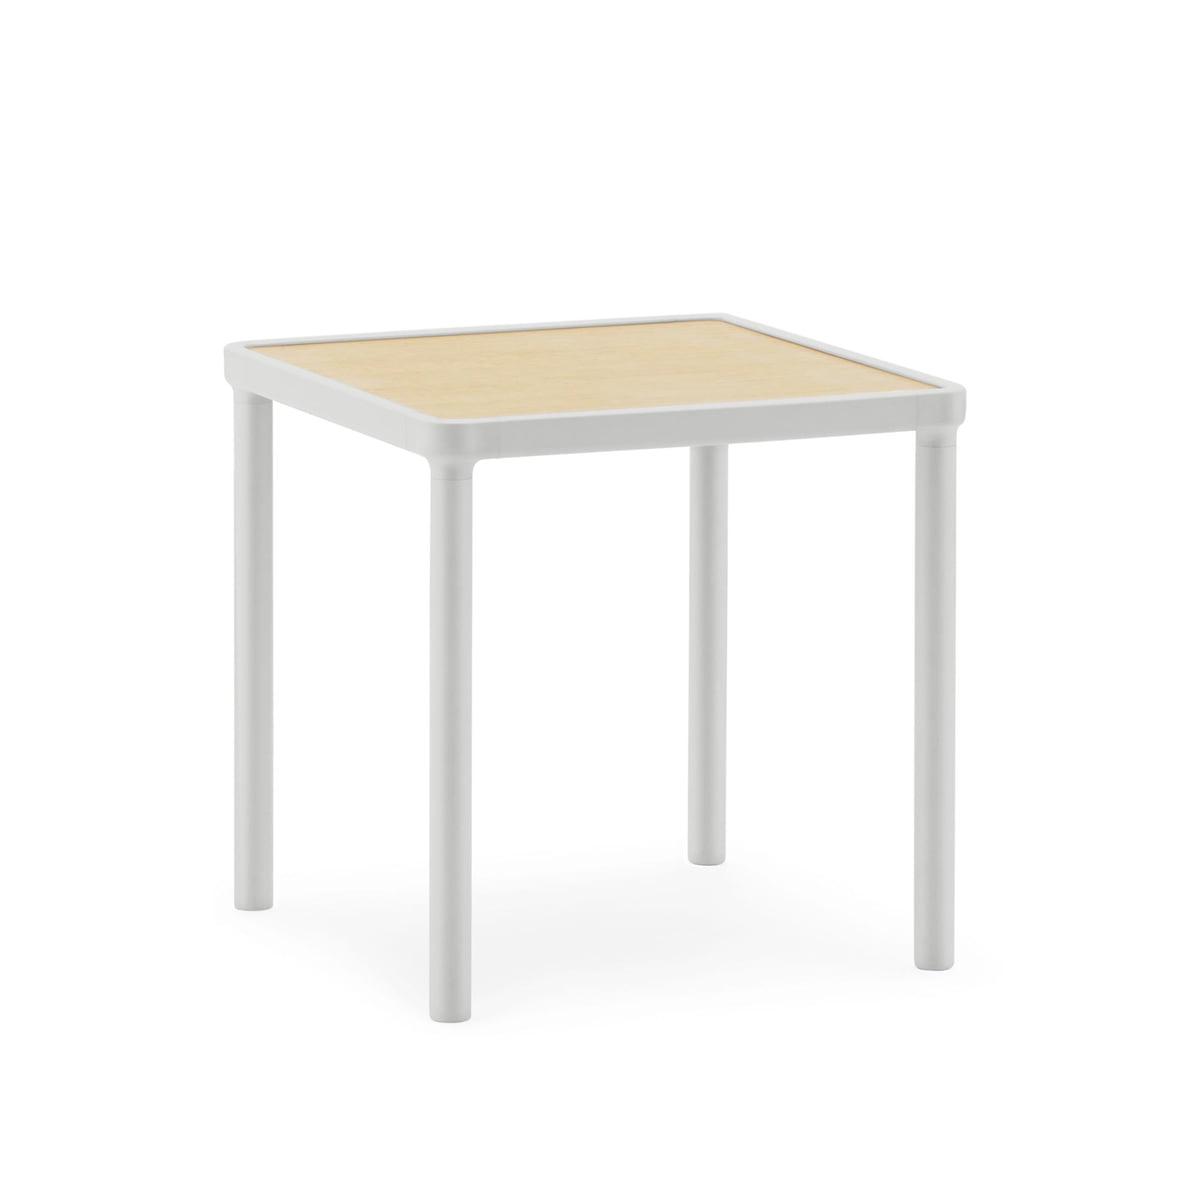 Case coffee table small 40 x 40 cm by Normann Copenhagen